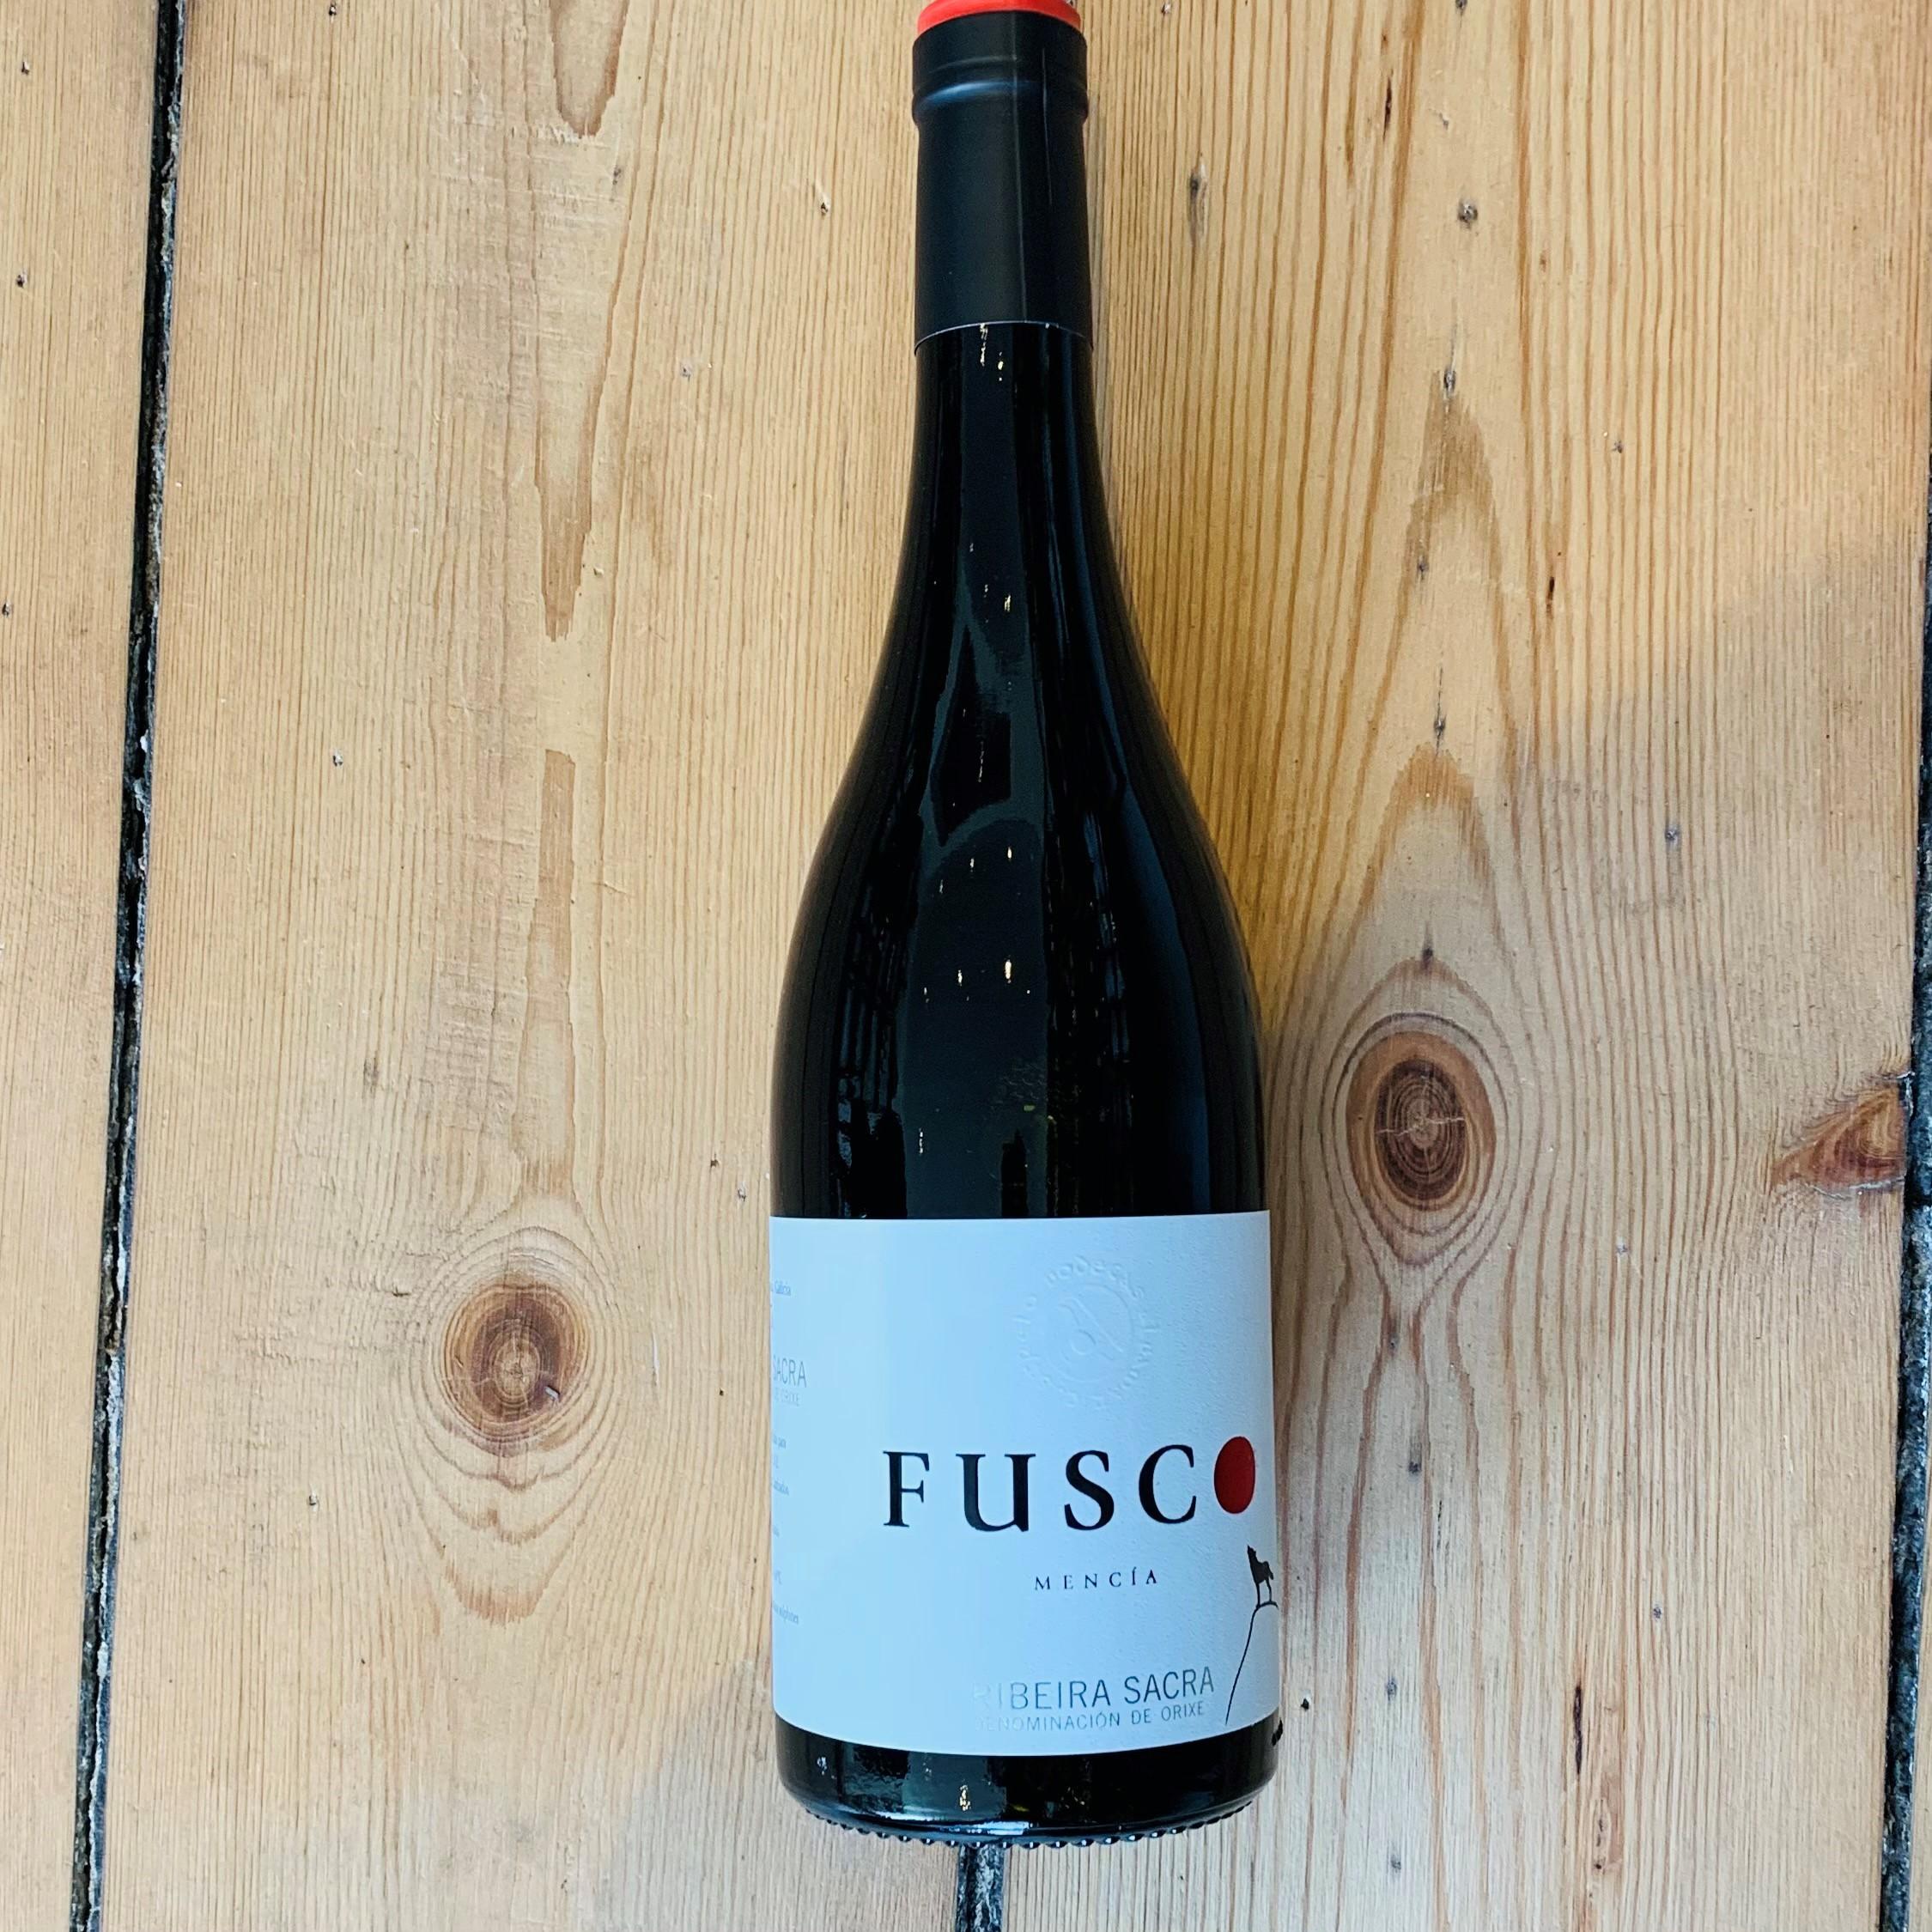 Albamar Fusco Mencia 2018